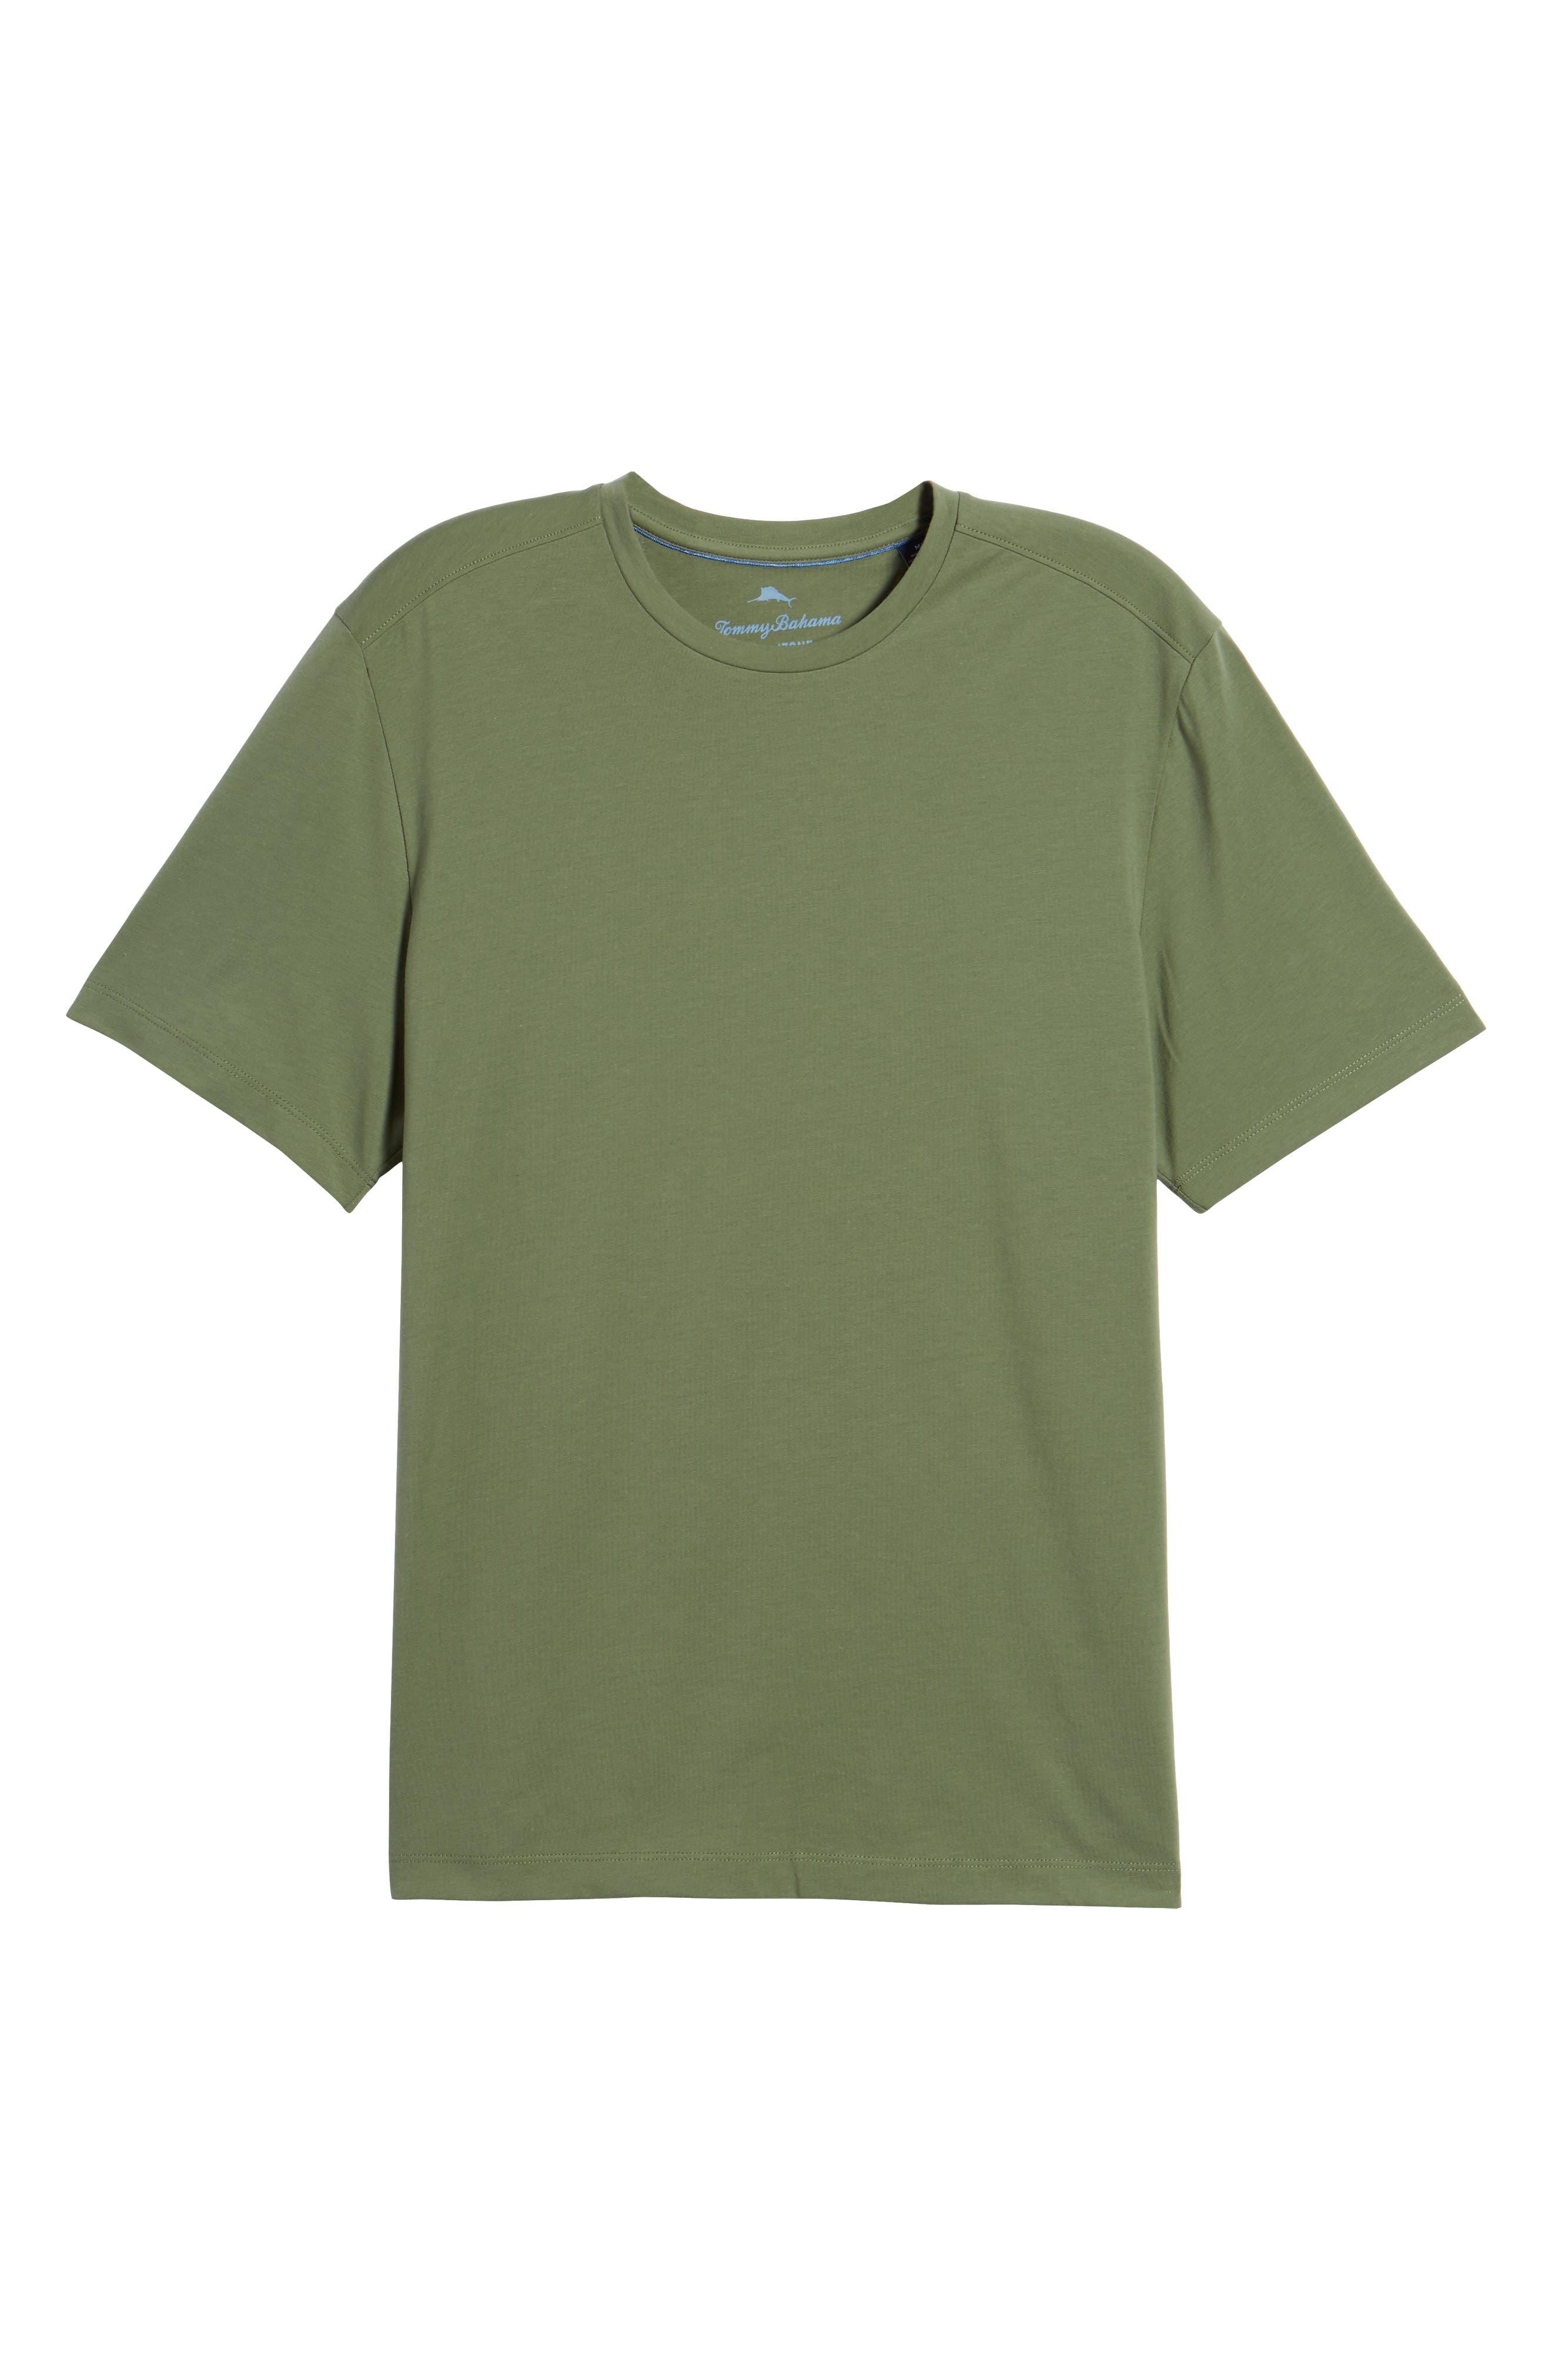 Tropicool T-Shirt,                             Alternate thumbnail 50, color,